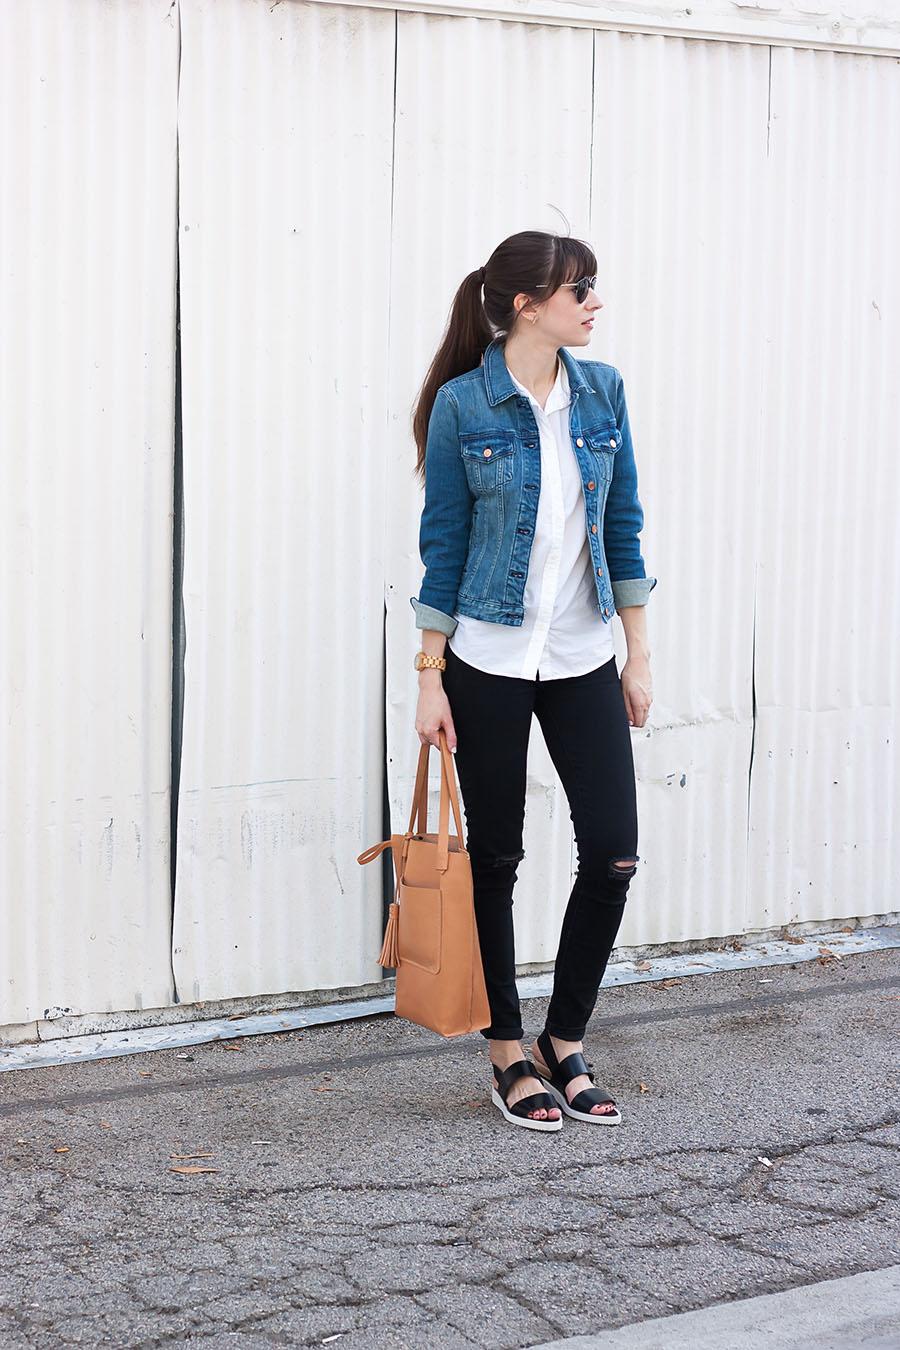 Everlane Street Shoe, J.Crew Denim Jacket, Minnie and George, Street Style